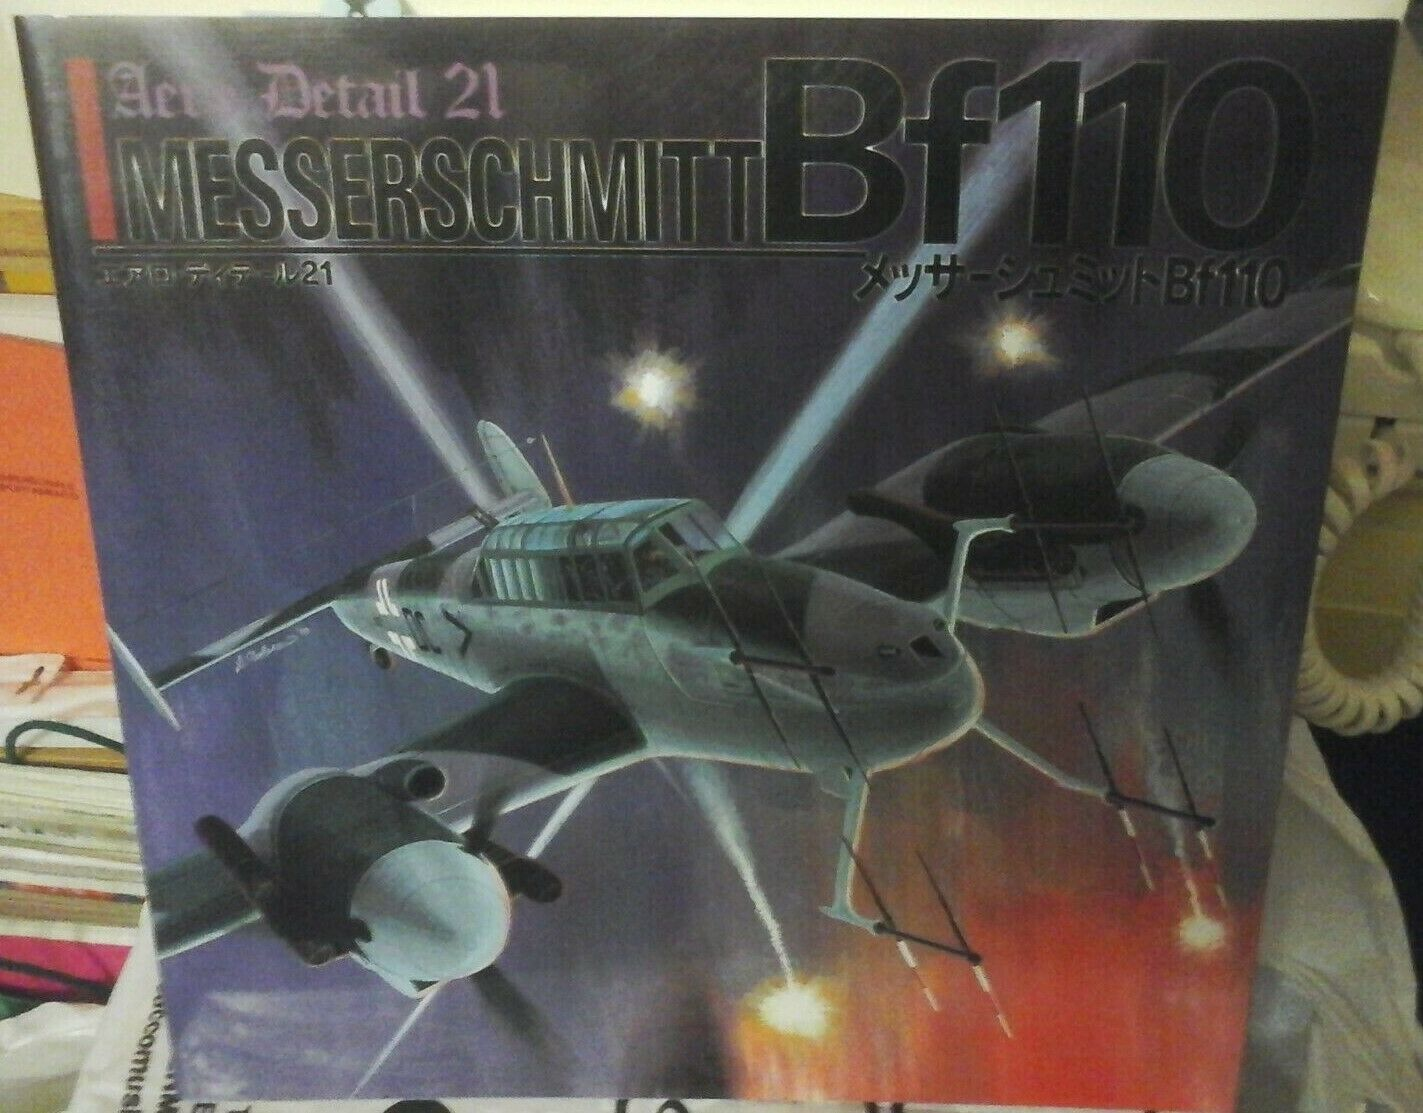 AERO DETAIL N.21-MESSERSCHMITT BF110-BY SHIGERU NOHARA-MODEL GRAPHIX PB